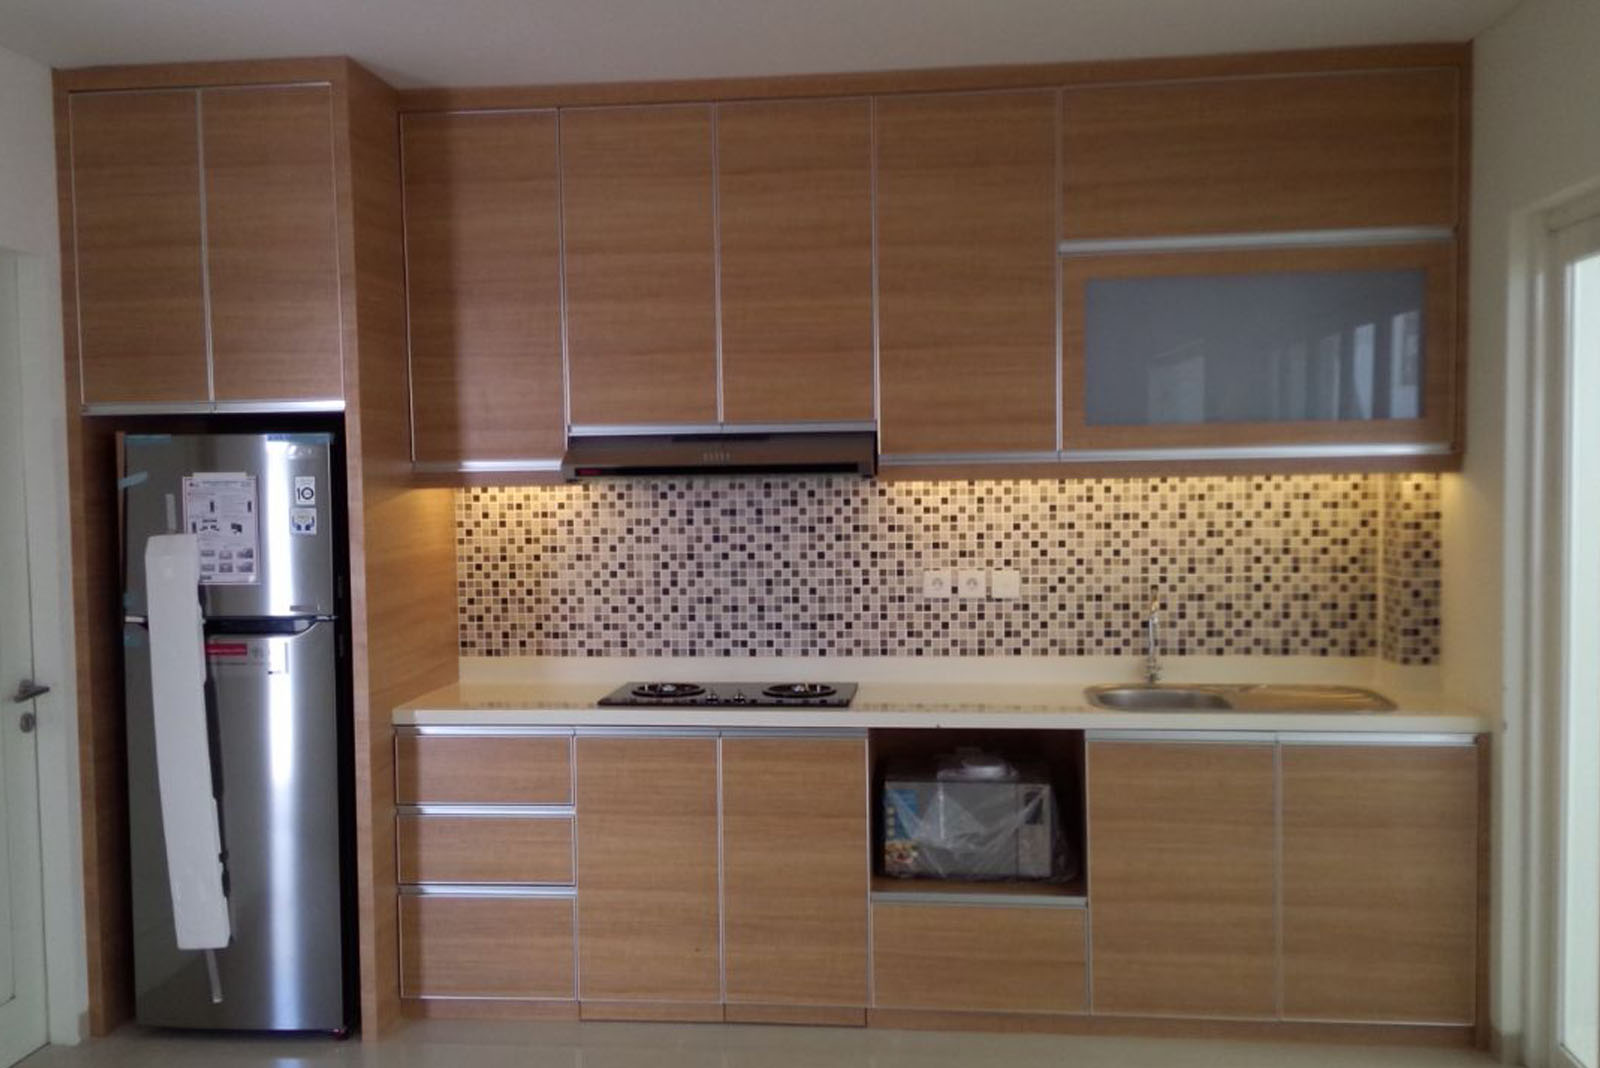 Kitchen Set Room Image And Wallper 2017